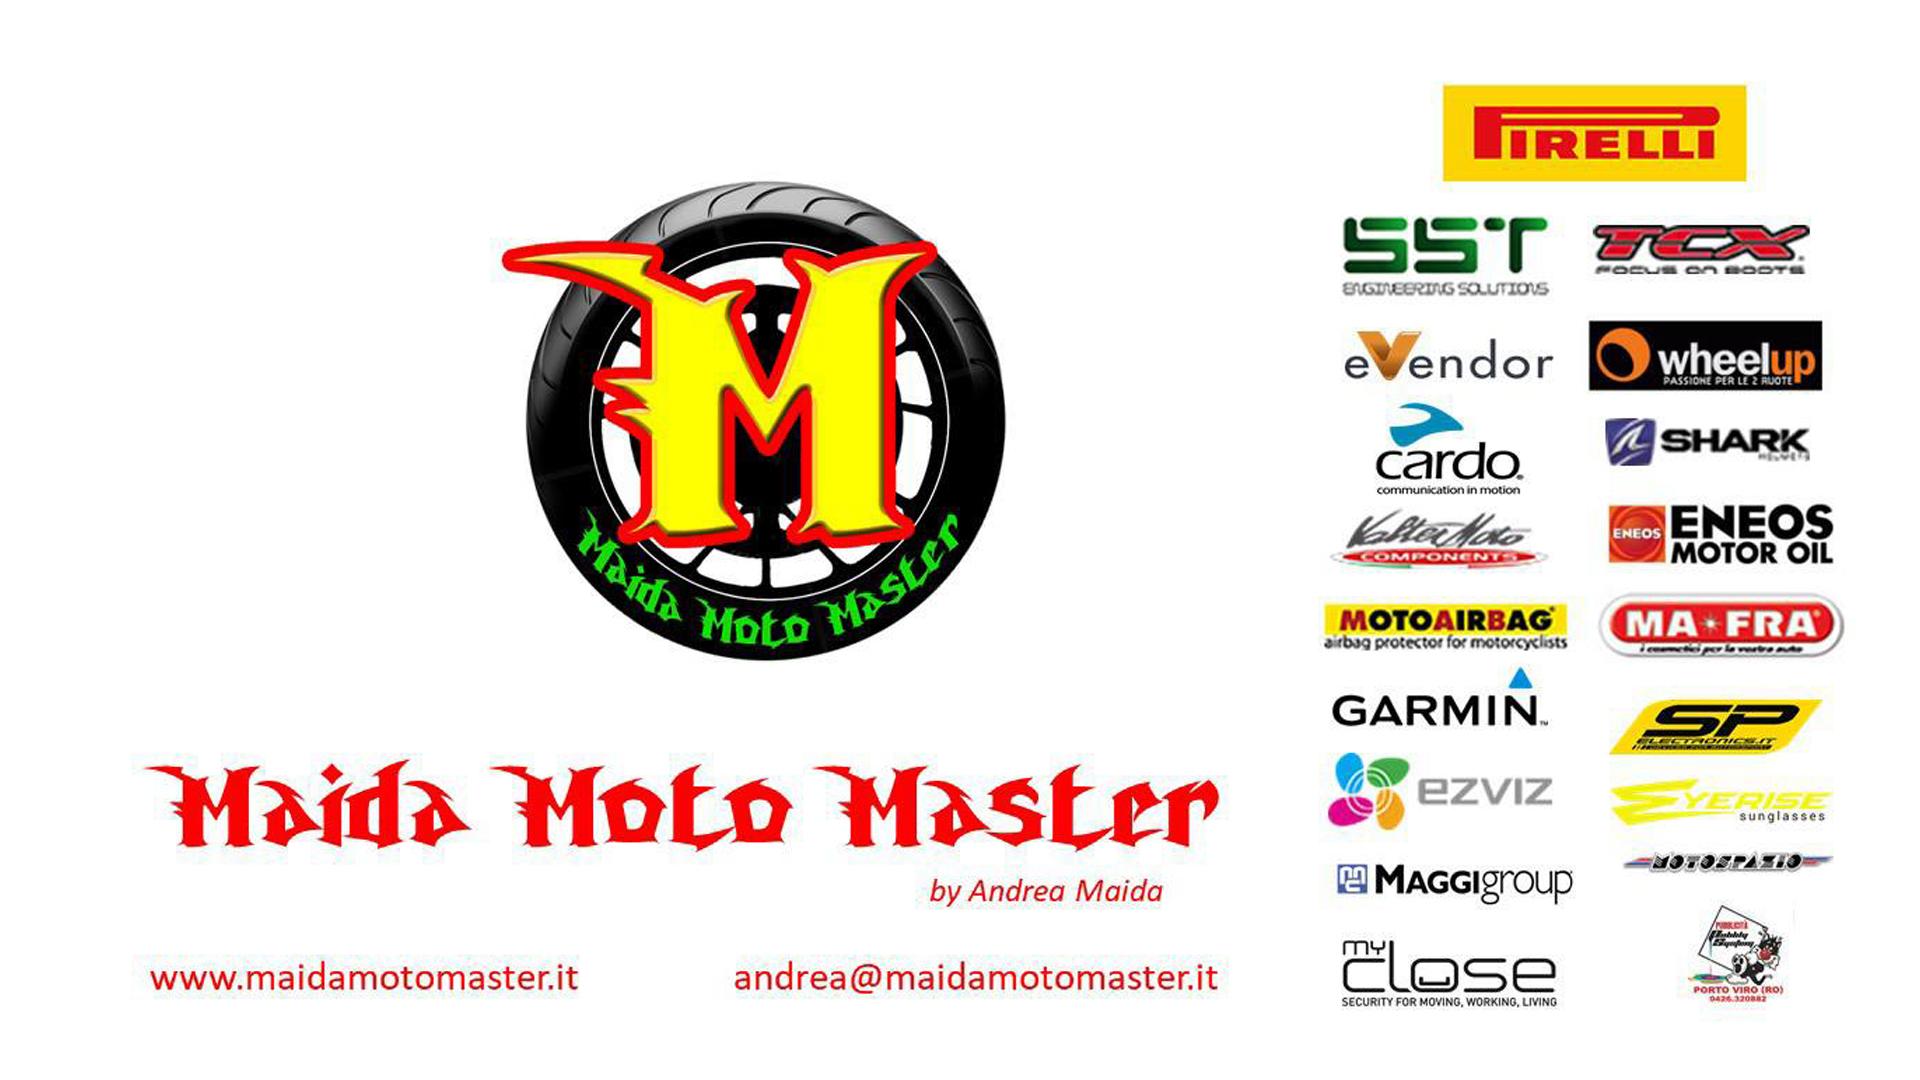 Maida Moto Master